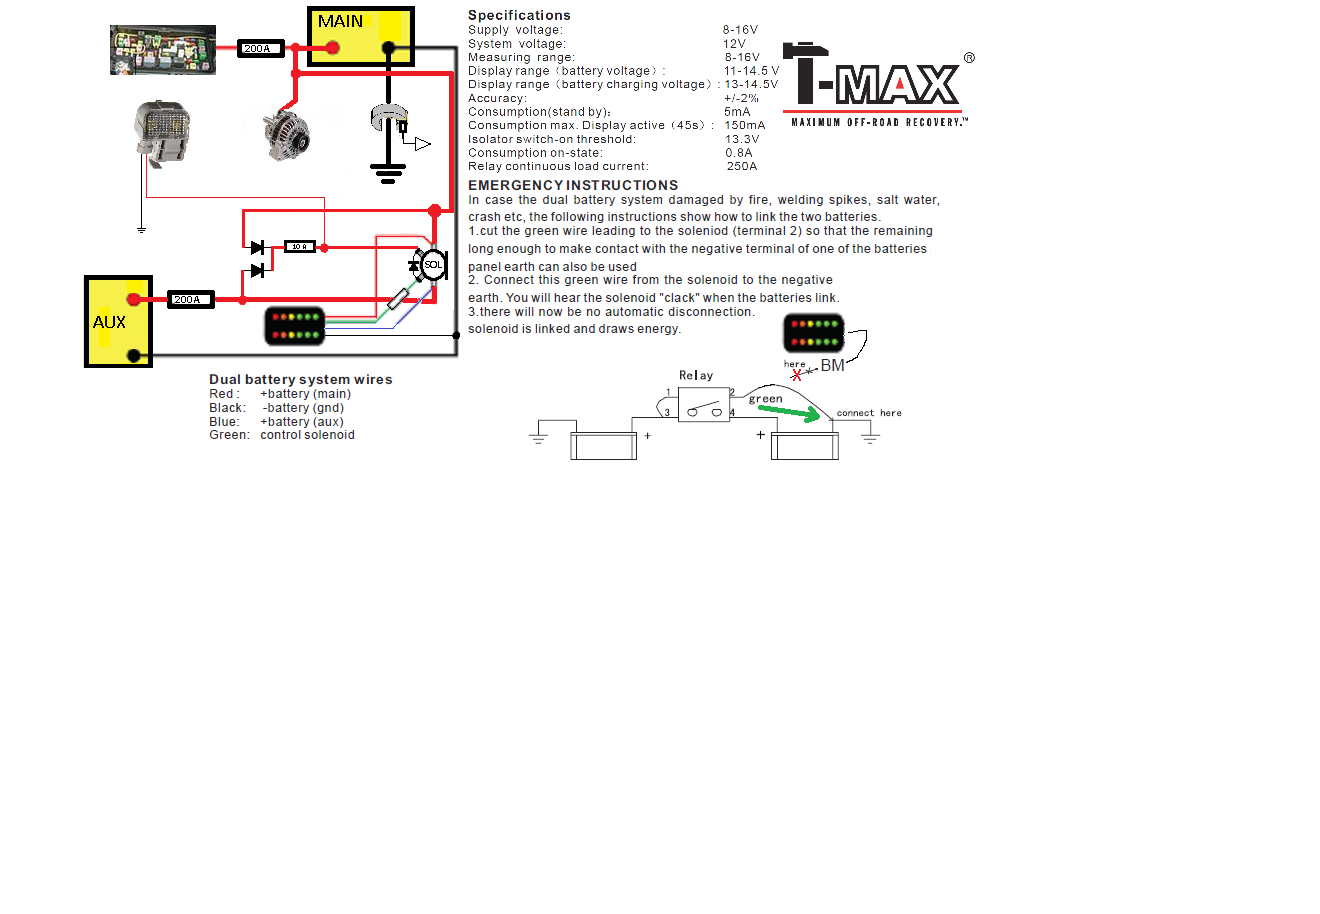 Tmax Dual Battery Controller Output Repair Ih8mud Forum Wiring Diagram On Truck Auxiliary 2013 Sierra 005